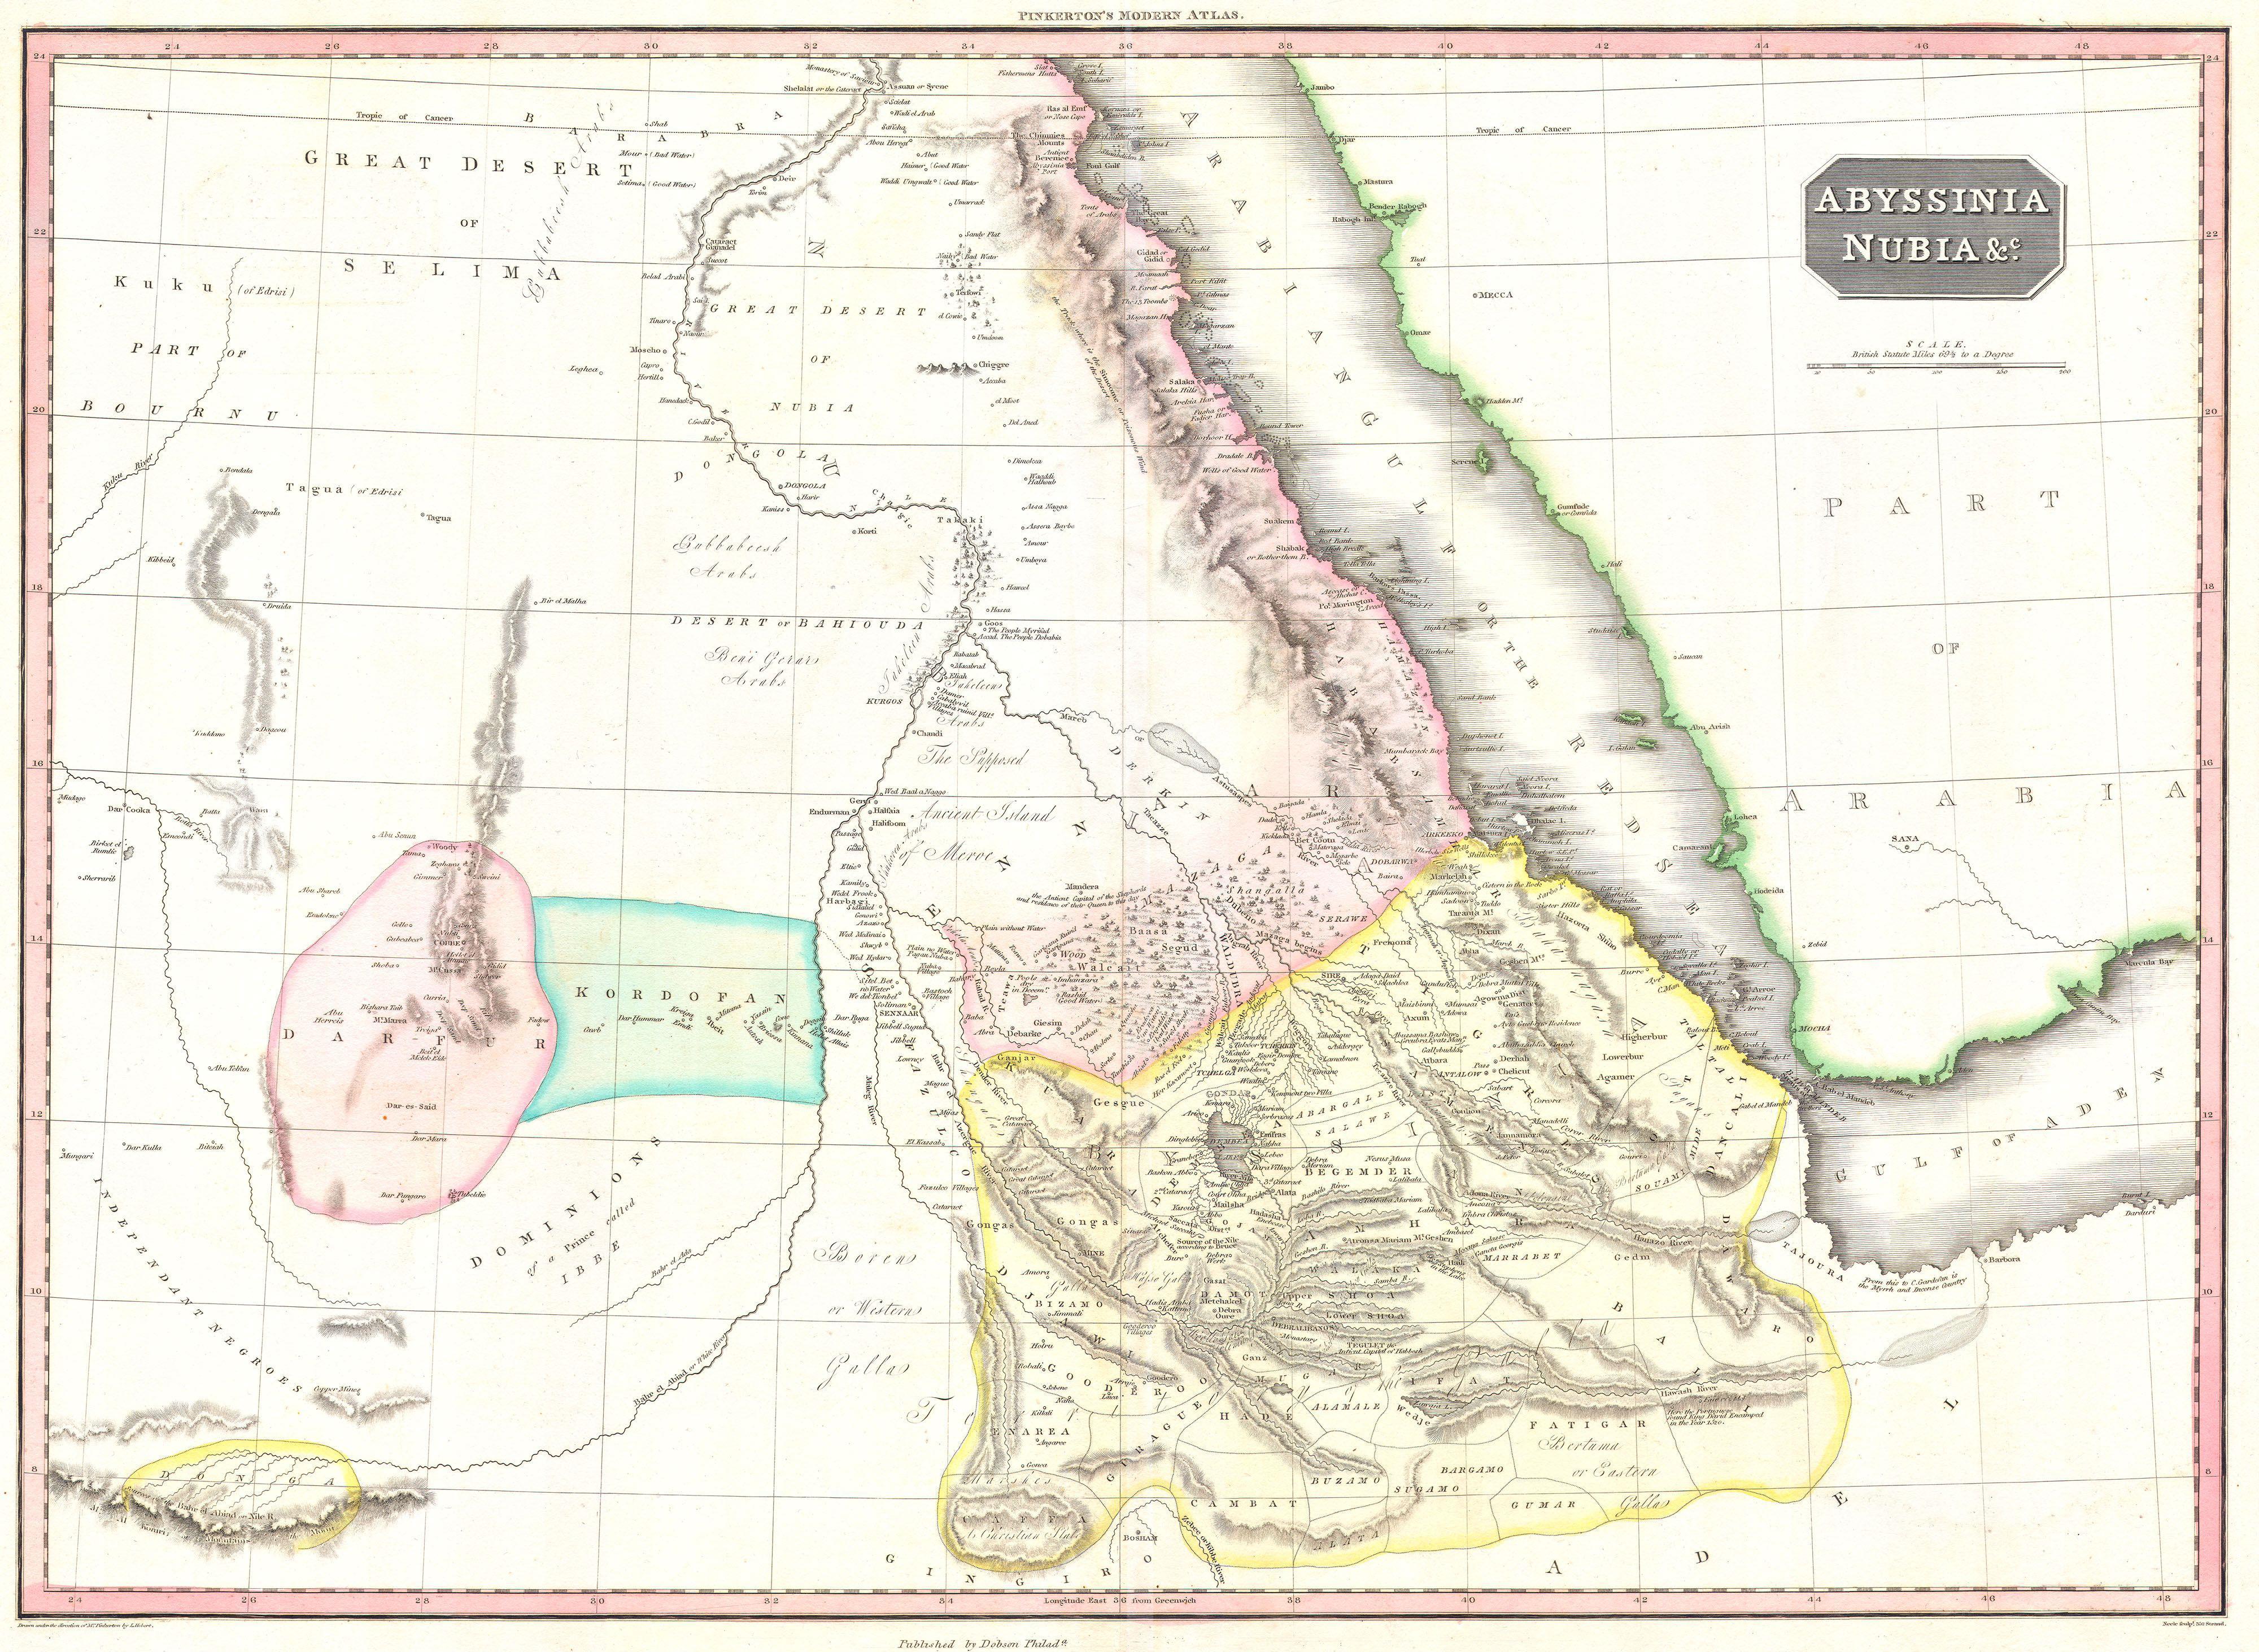 File:1818 Pinkerton Map of Abyssinia ( Ethiopia ), Sudan ^ Nubia